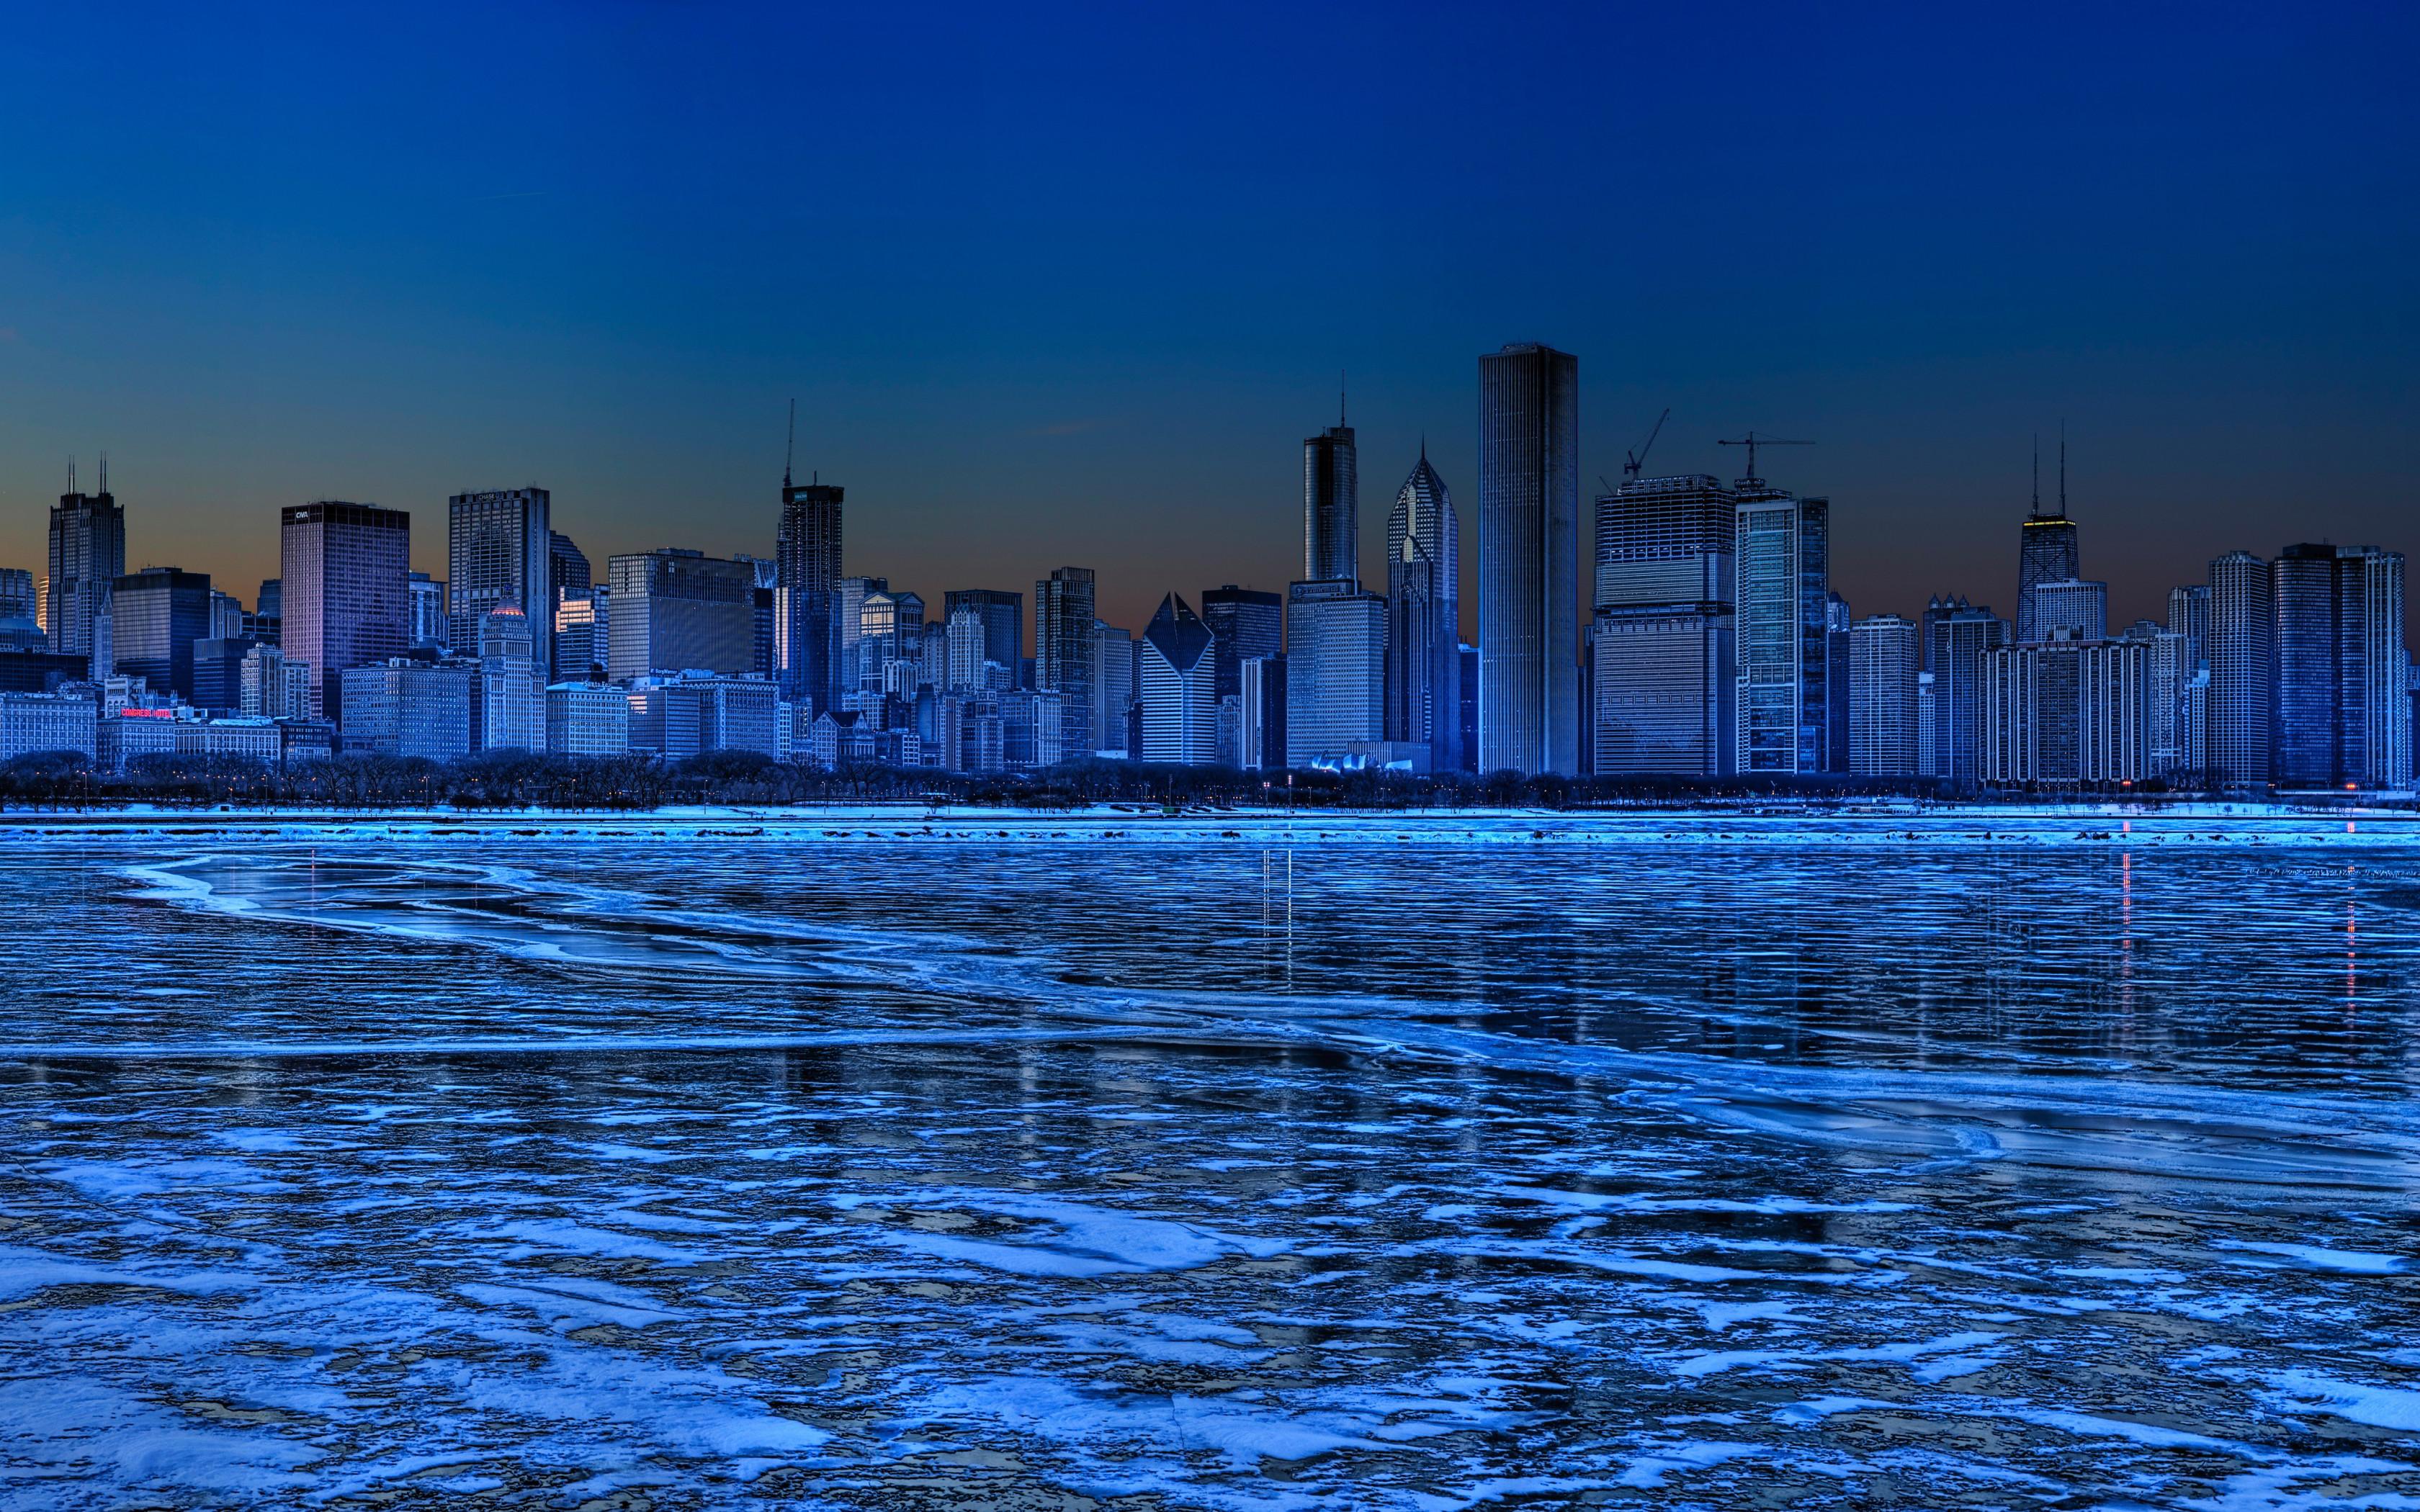 40 high resolution chicago skyline wallpaper on wallpapersafari - Chicago skyline wallpaper 1920x1080 ...